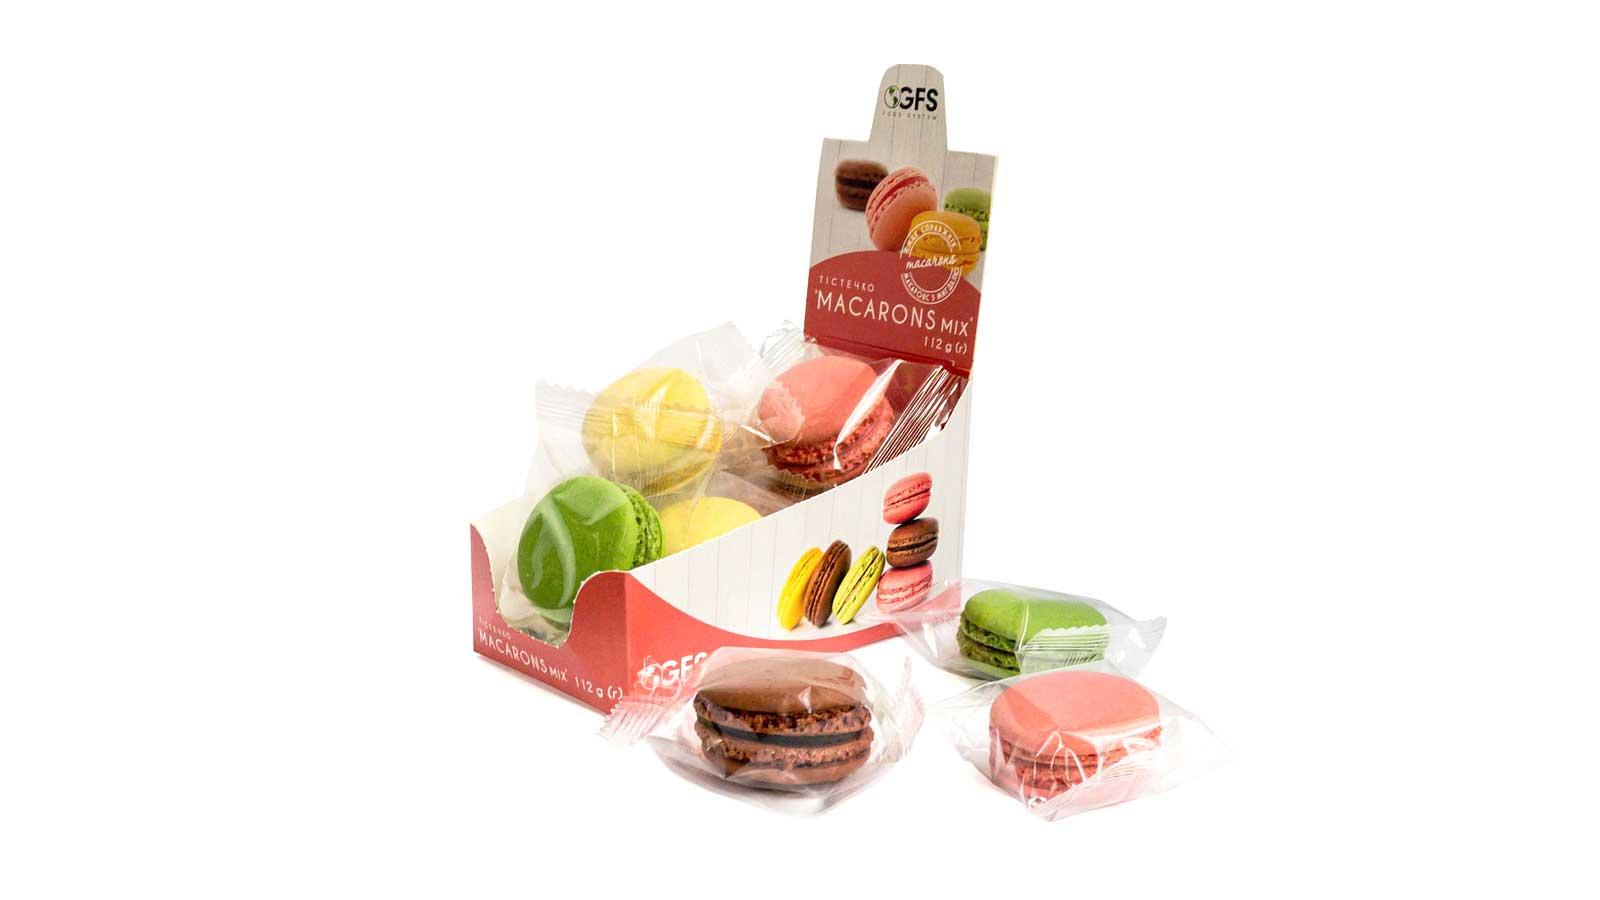 Macarons MIX 112g (flowpack 8pcs*14g)